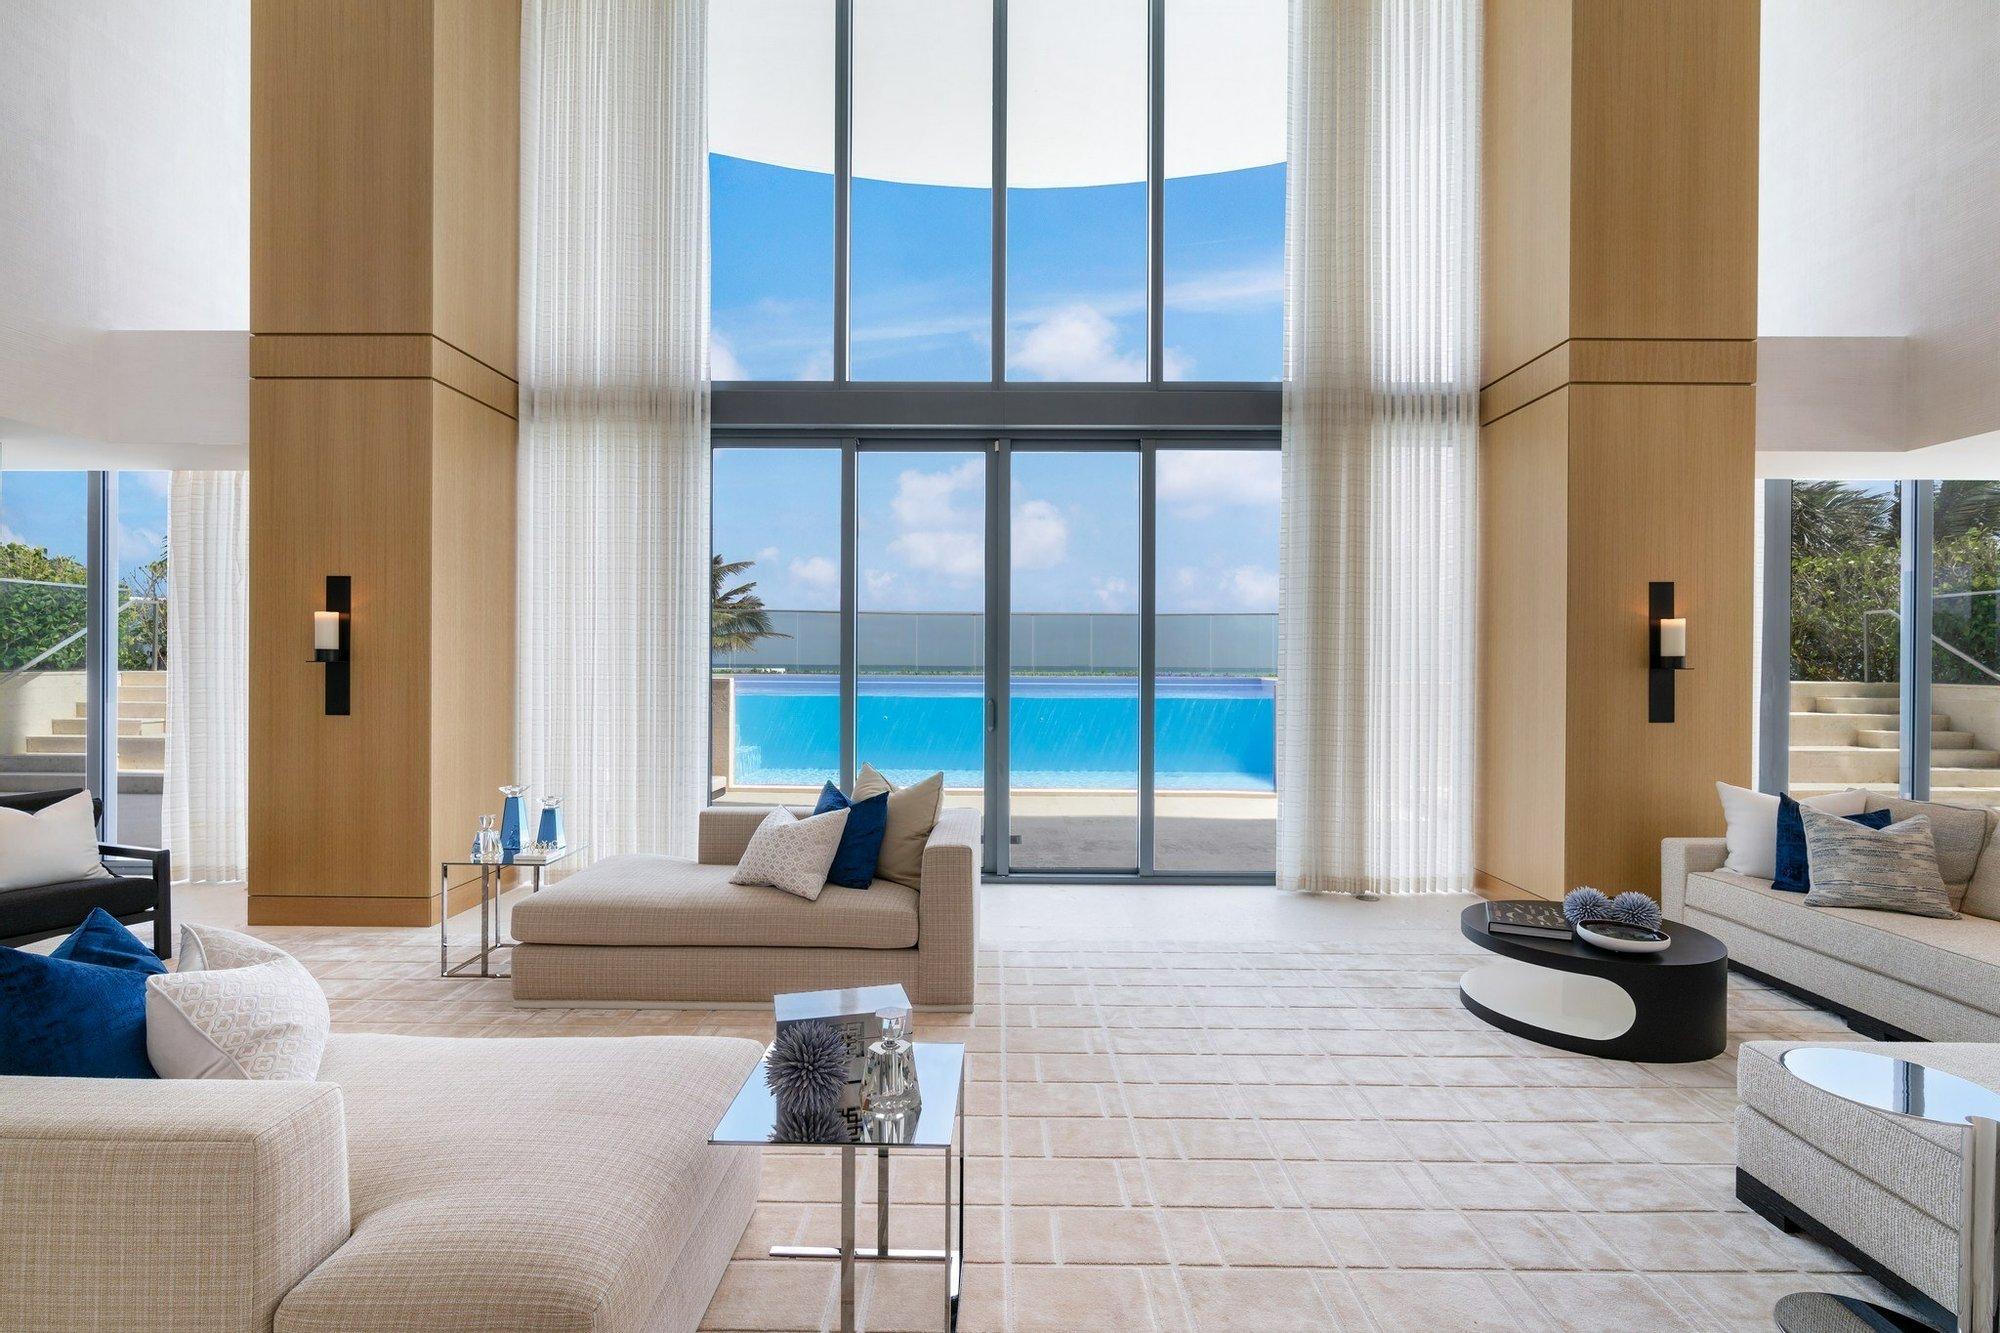 Condo in Golden Beach, Florida, United States 1